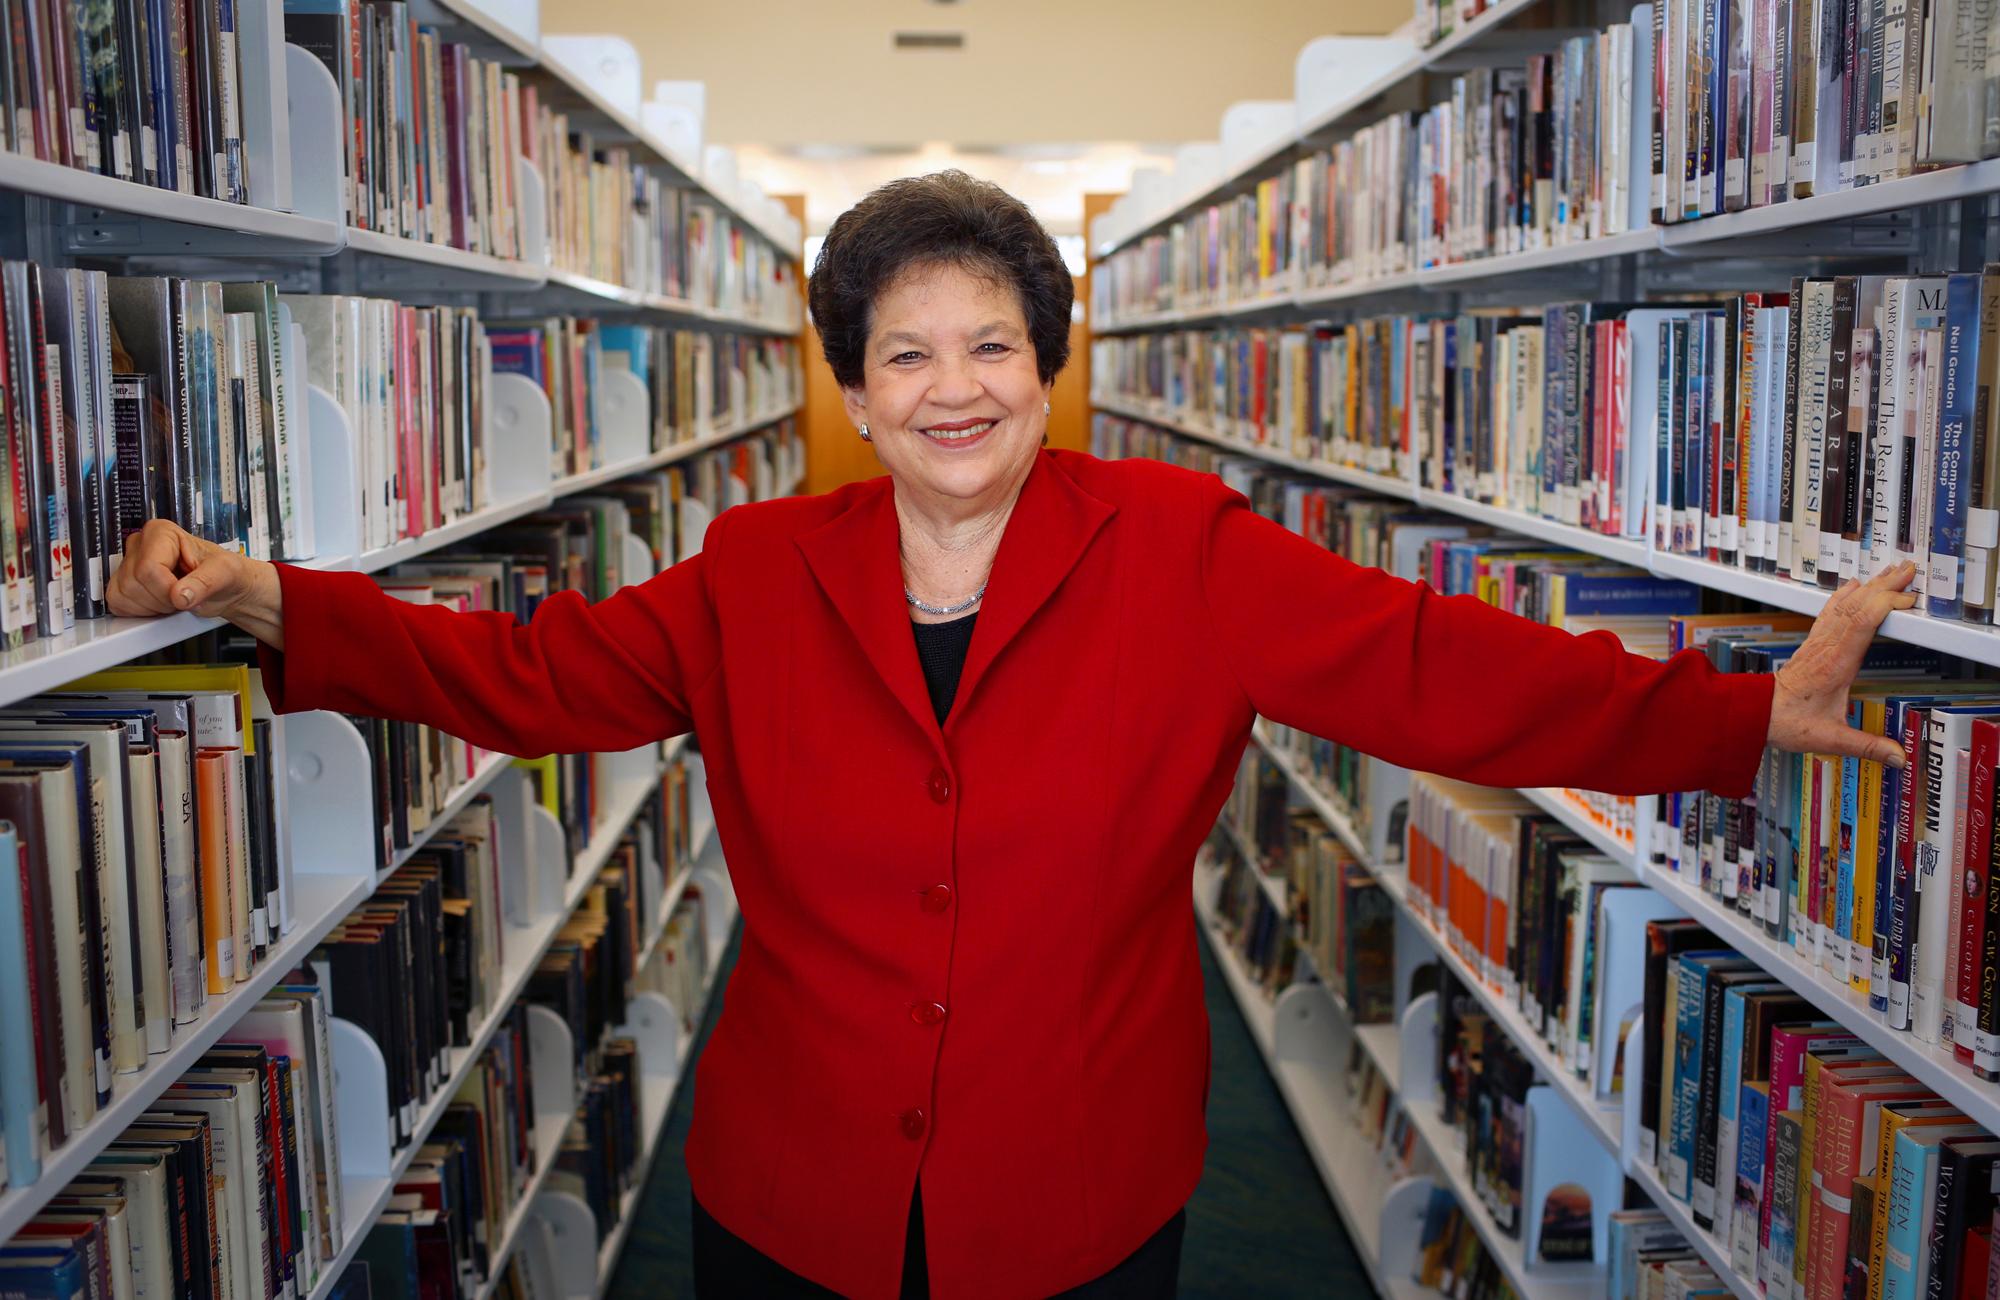 Lois frankel, united states congresswoman, florida district 22